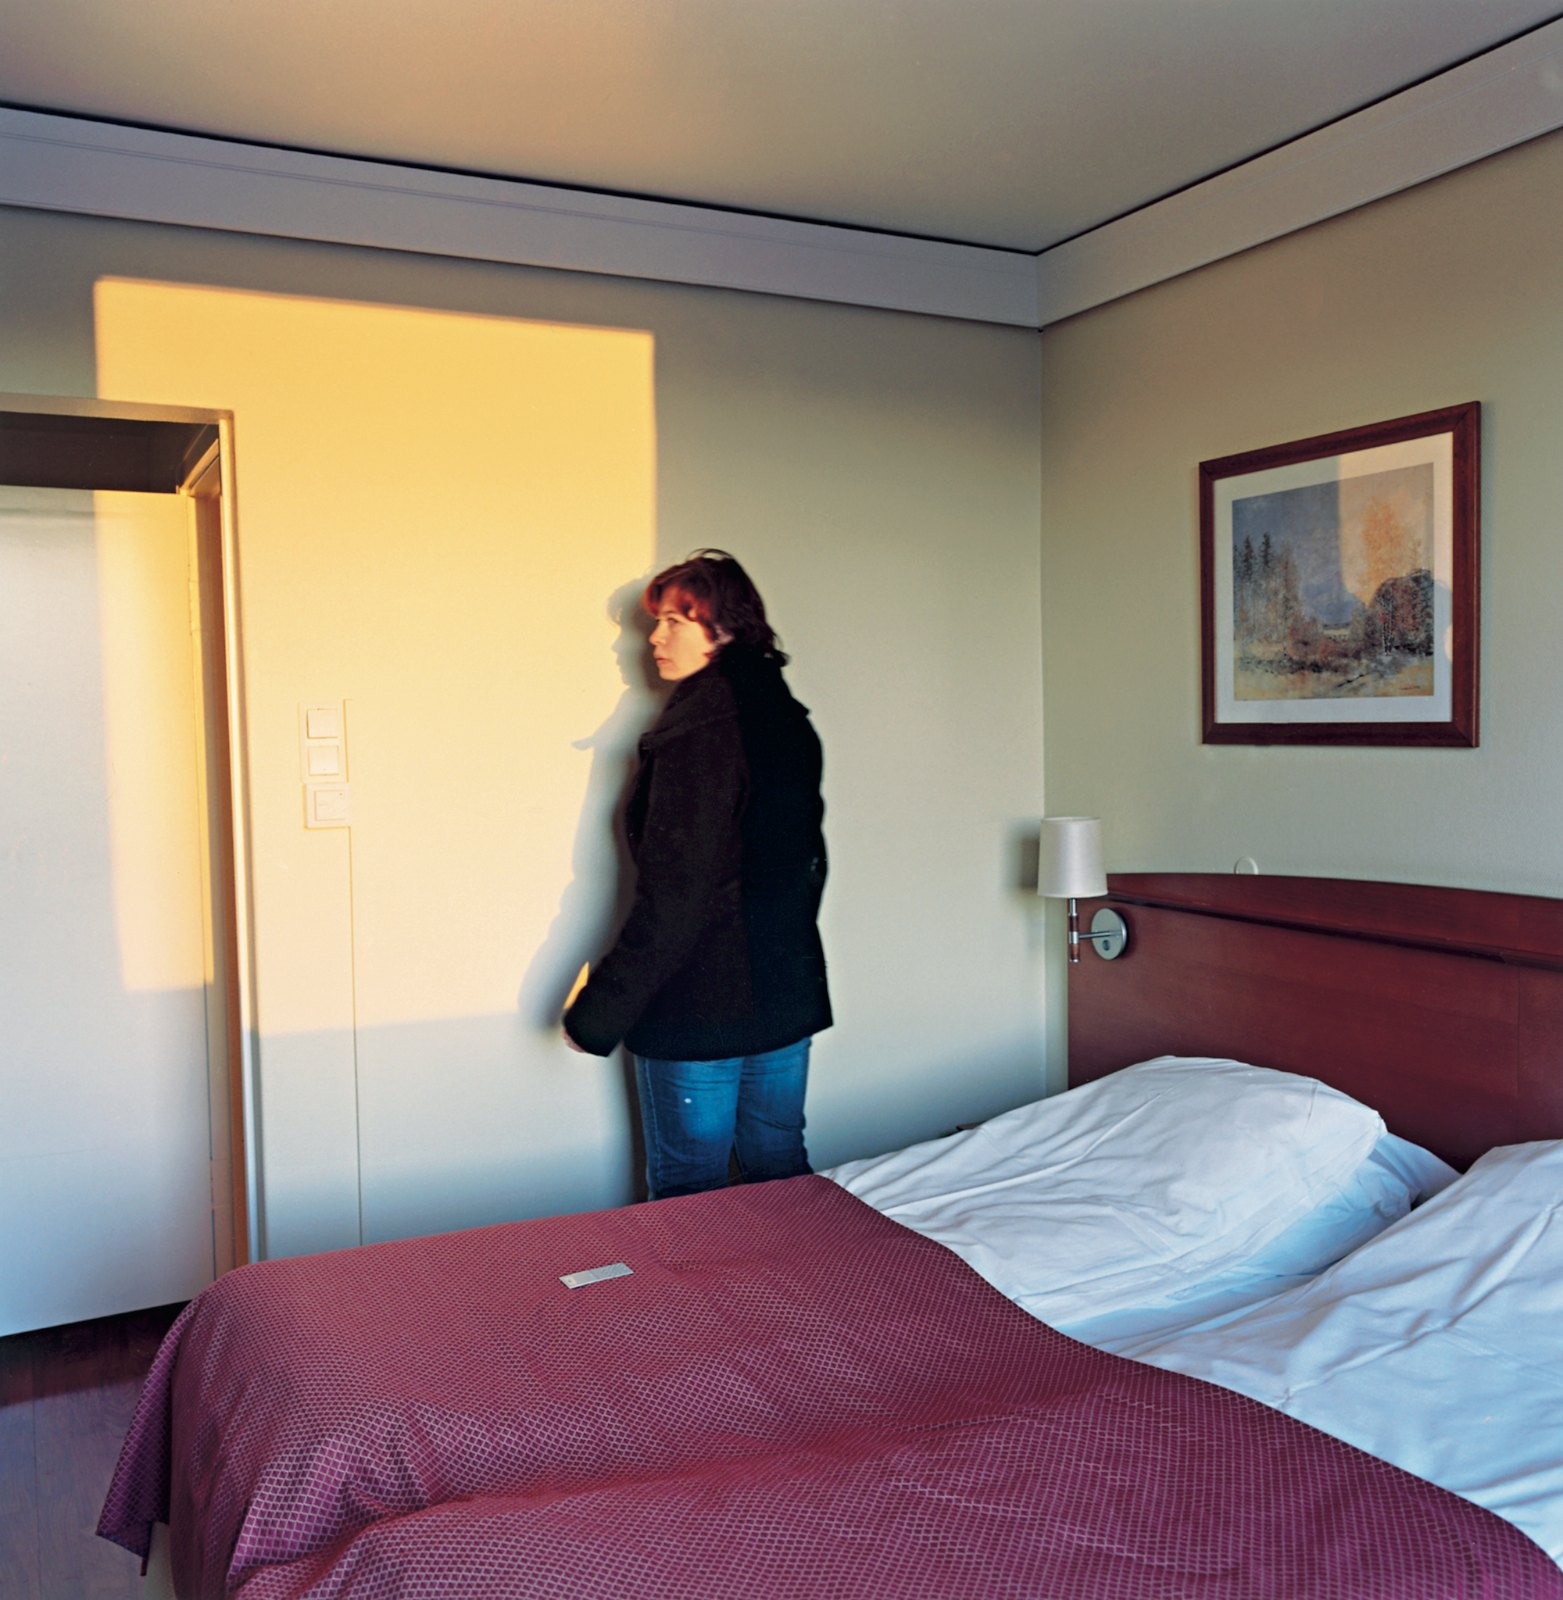 Vic Hotel 19:28, 2008, C-print, 65 x 65 cm